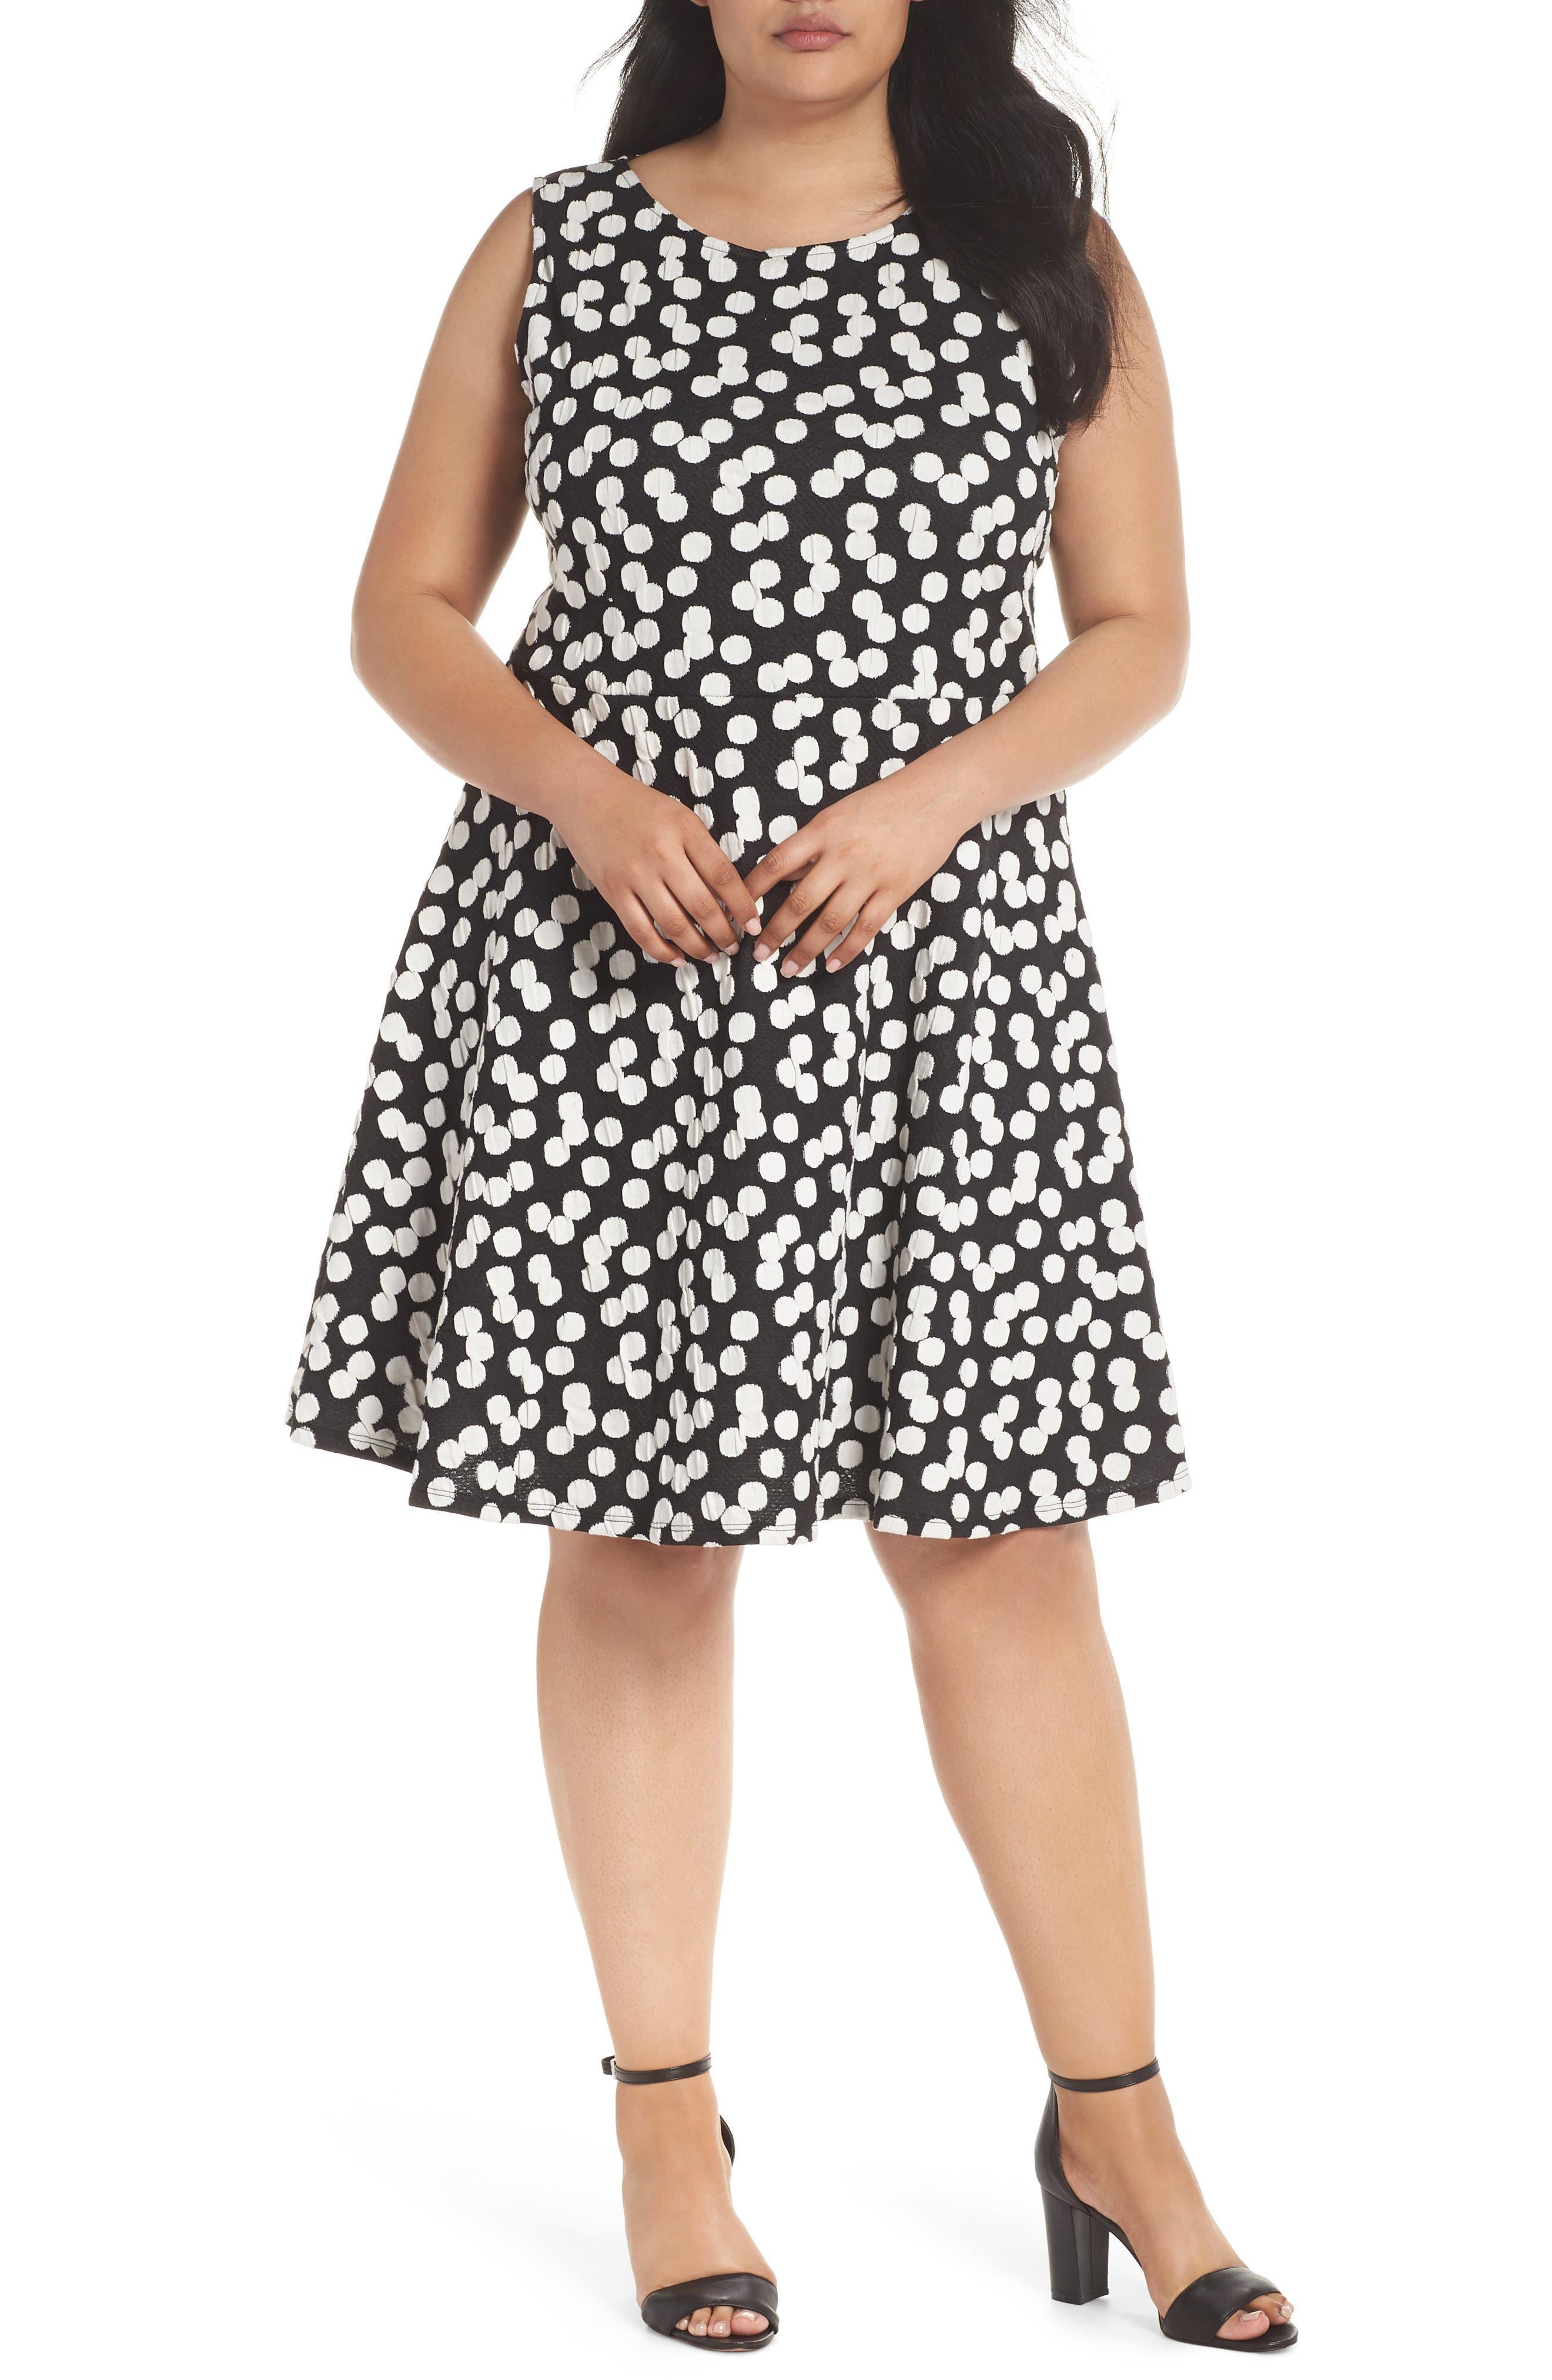 LEOTA Ava Fit & Flare Dress in Cluster Dot